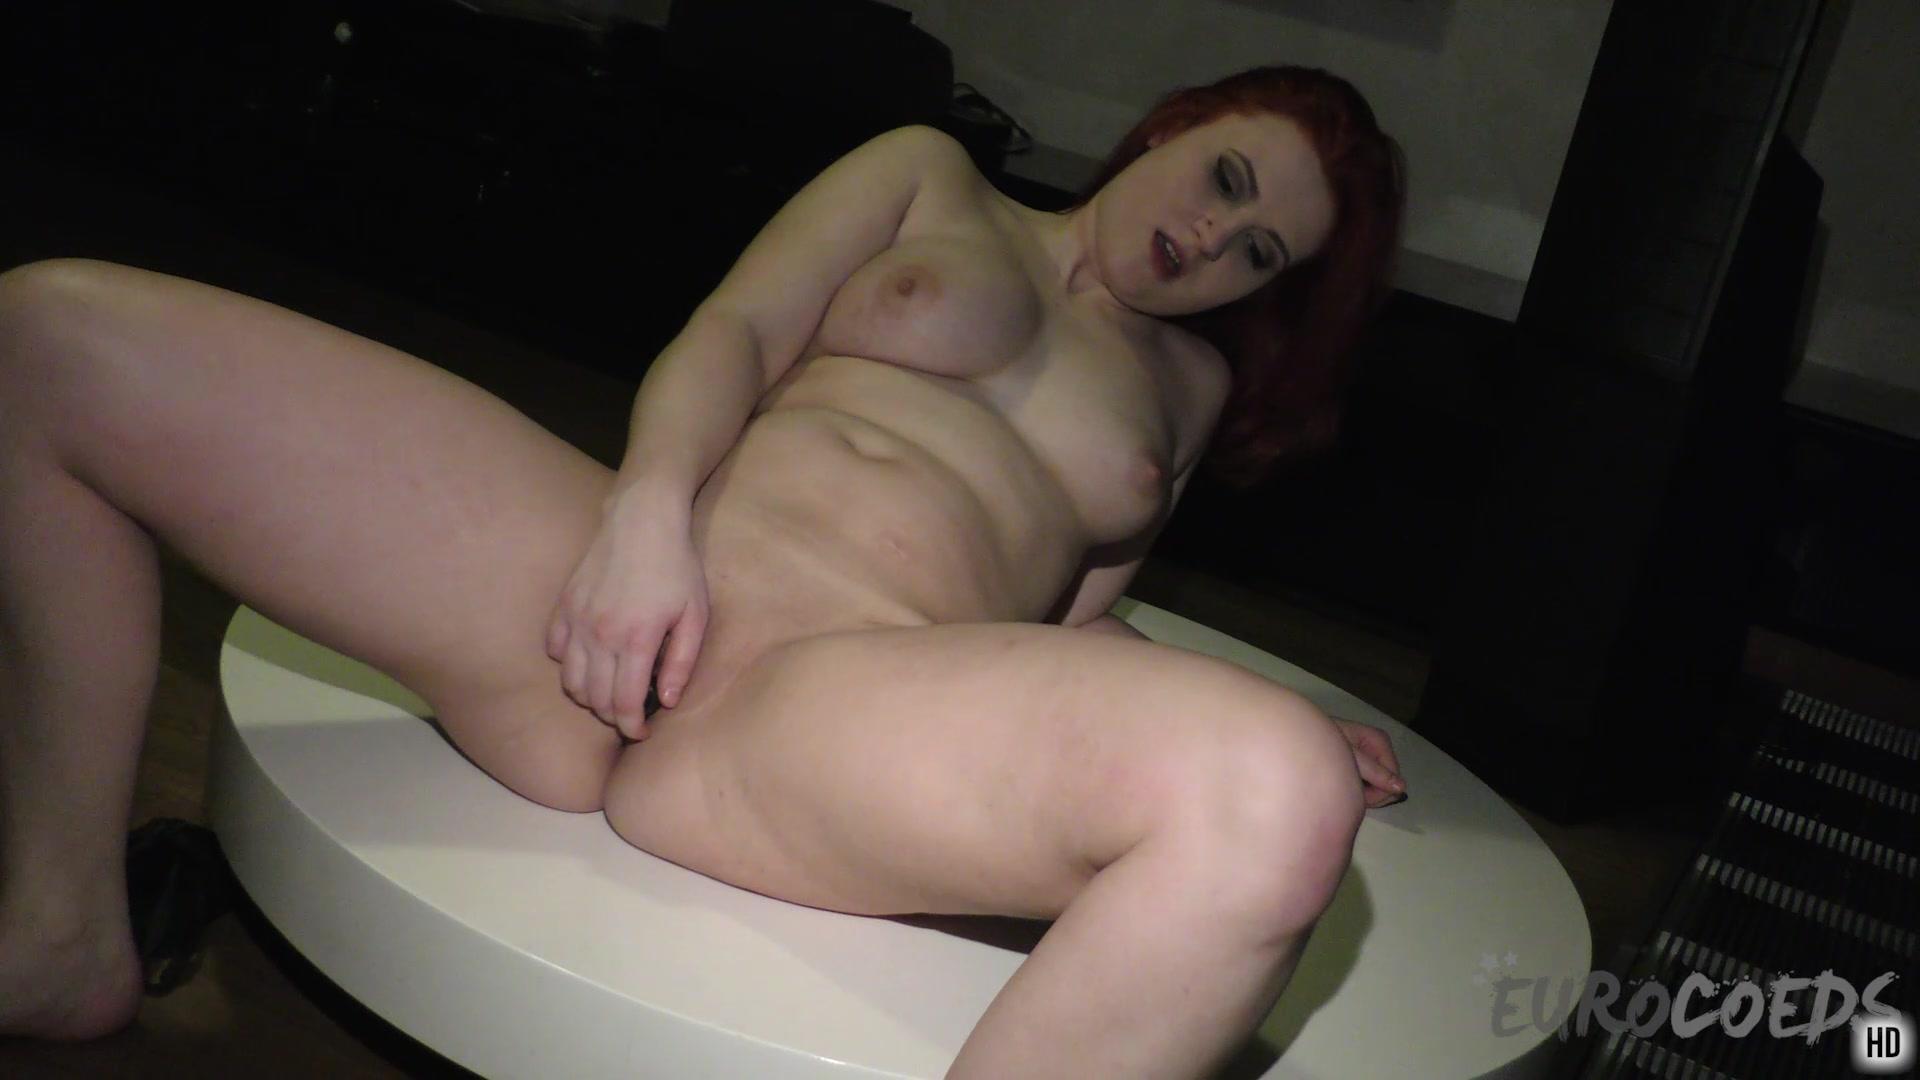 tiffany pollard sex tape naked